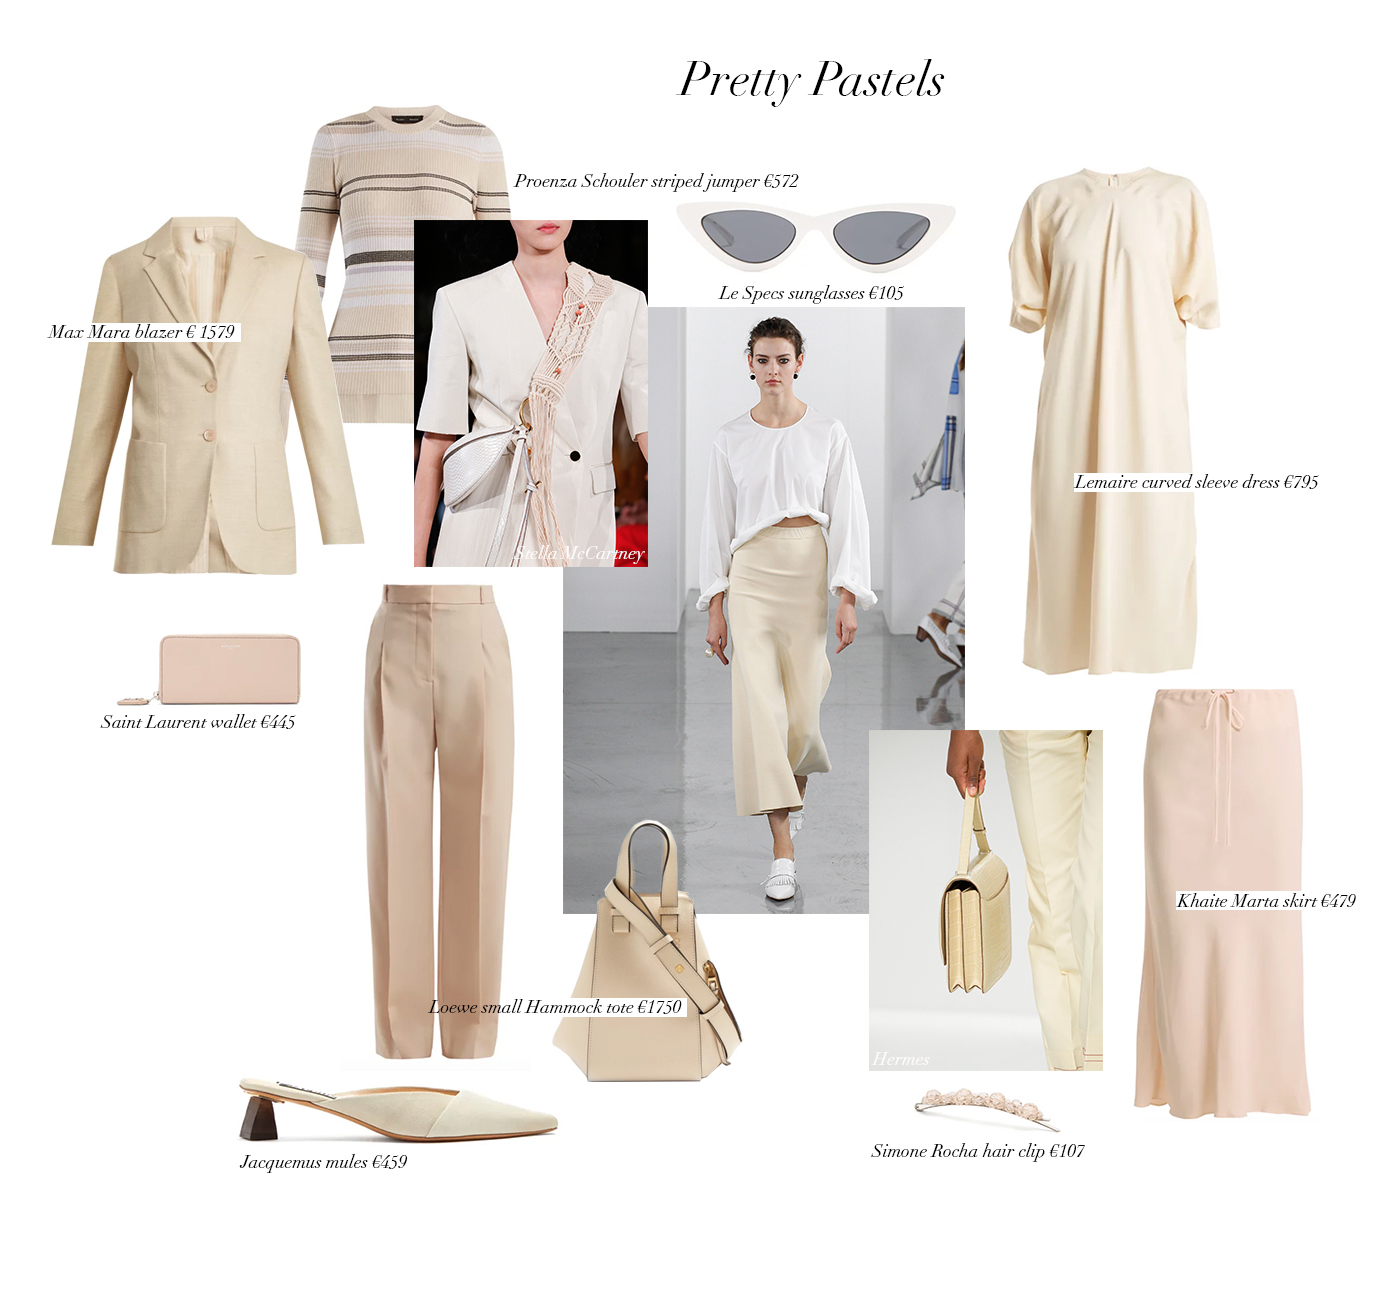 Trini | Pretty Pastels